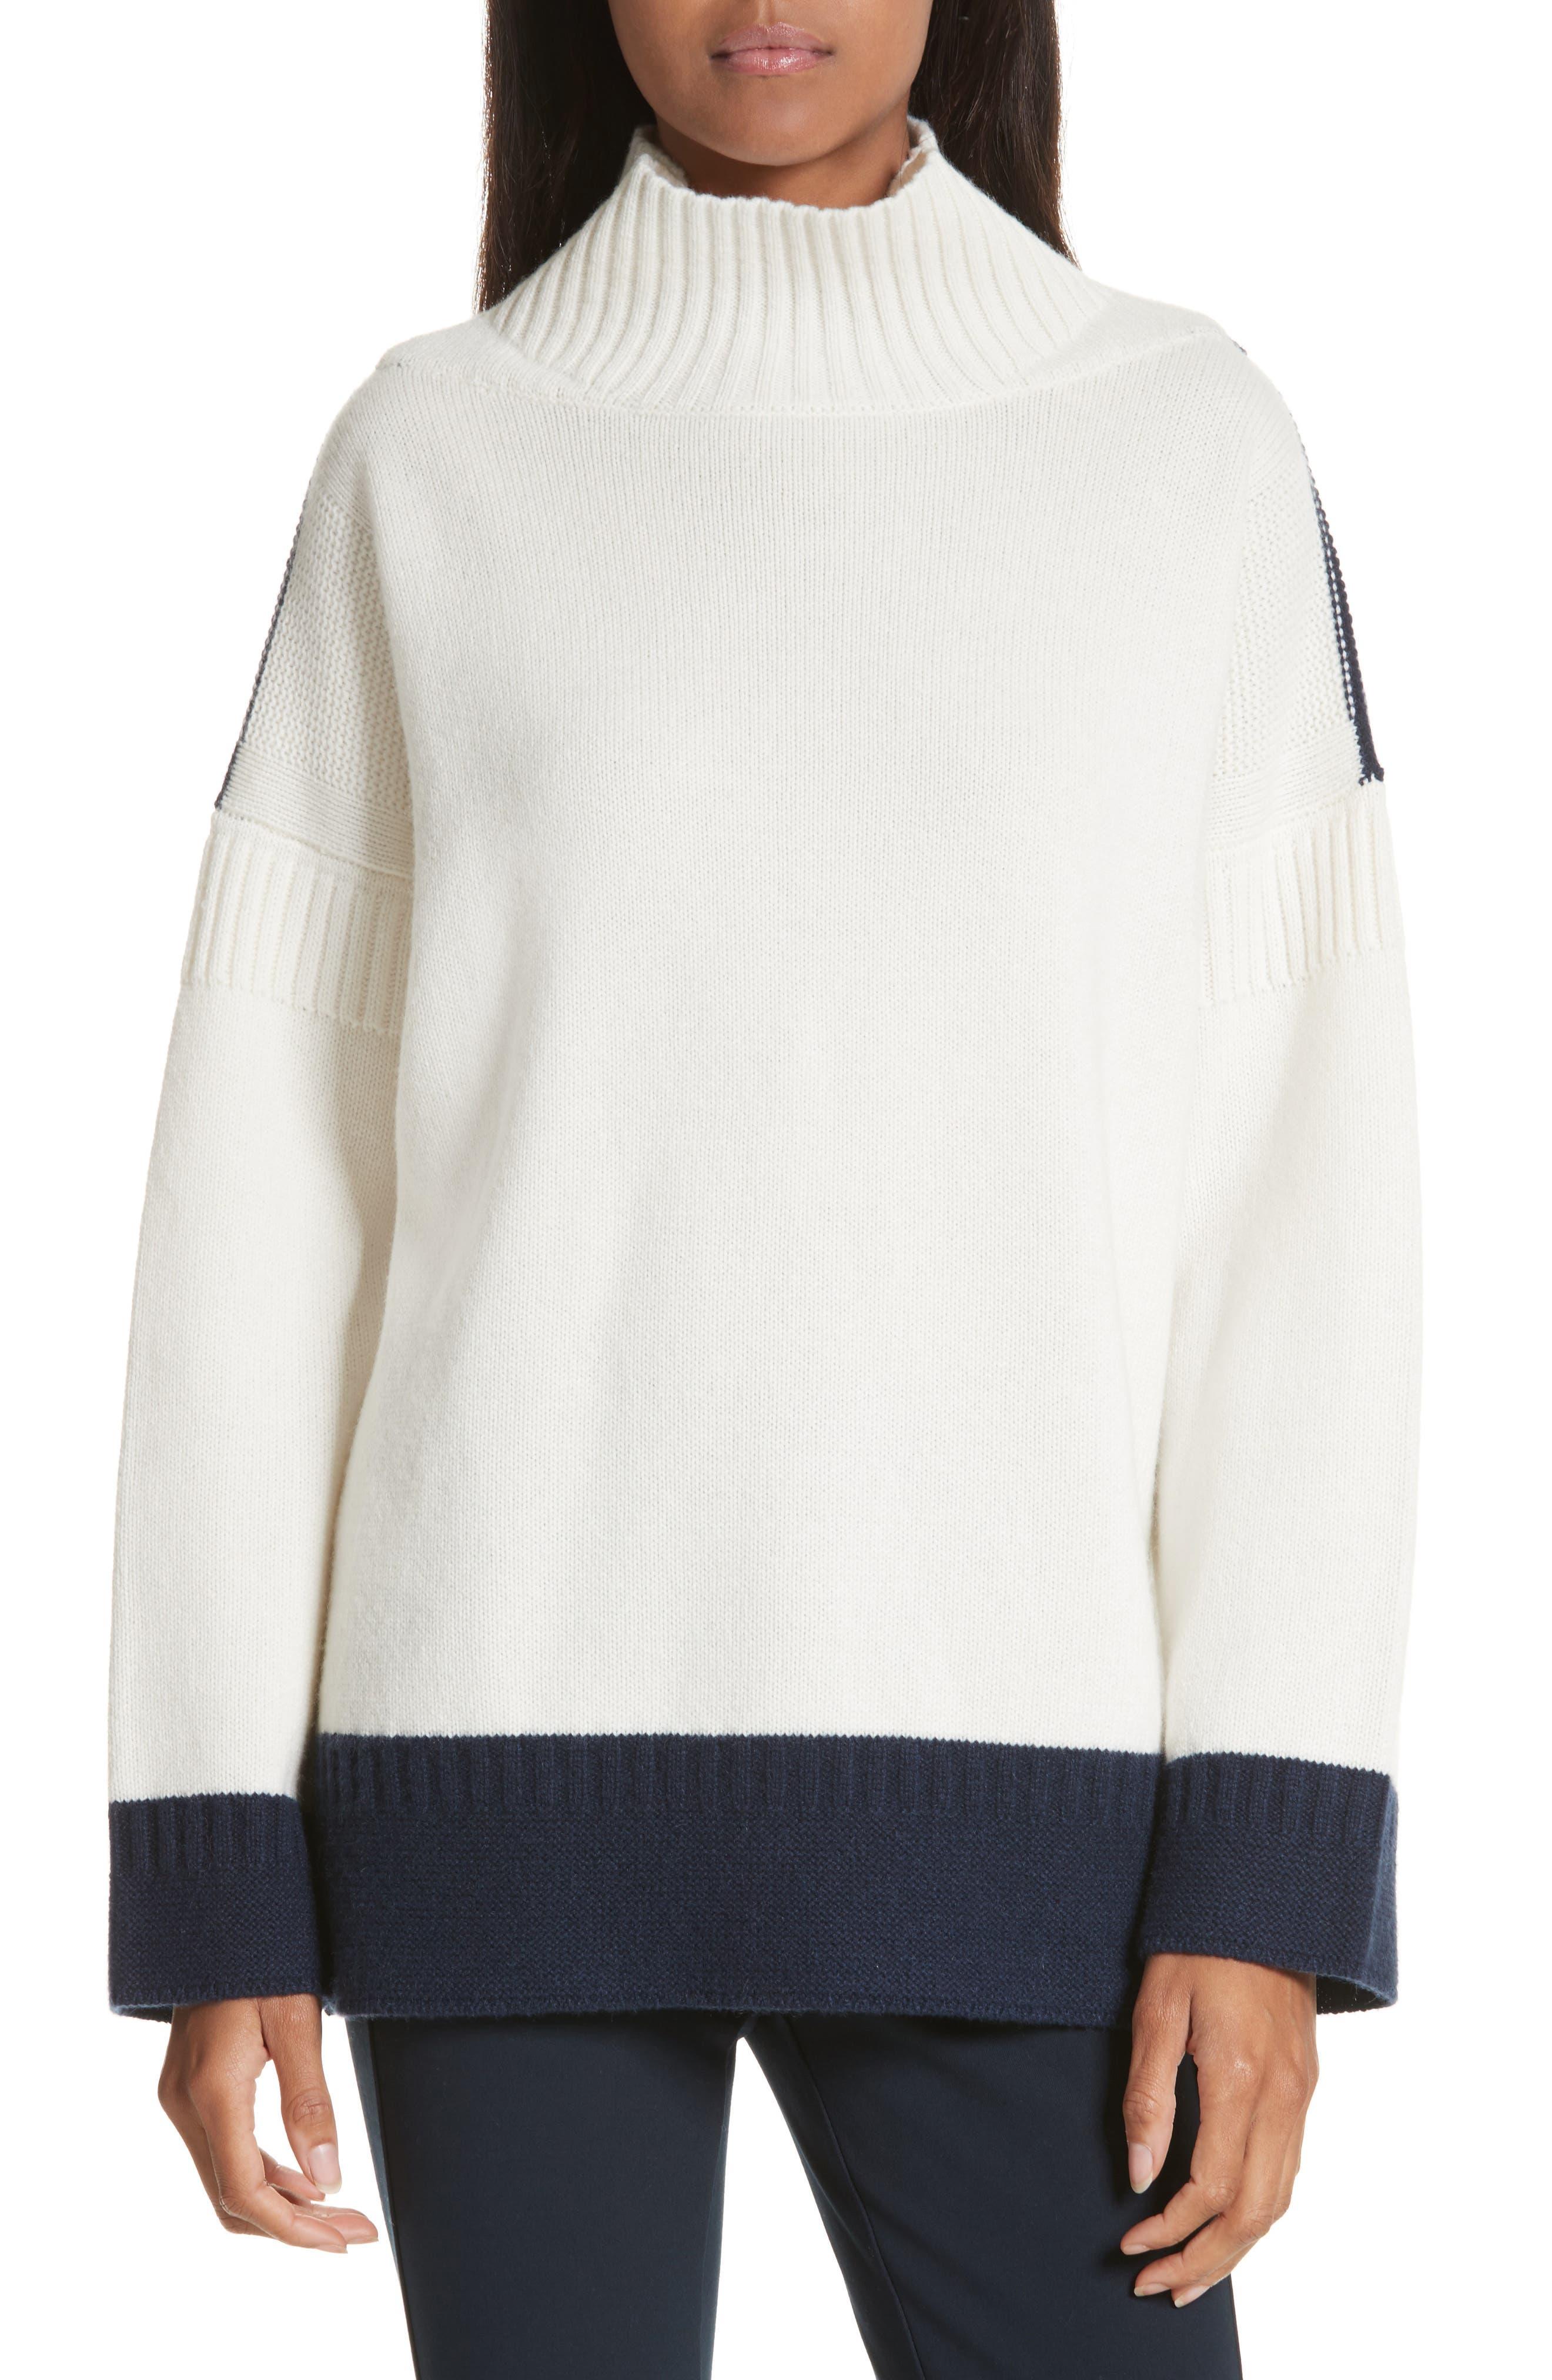 Aubree Funnel Neck Cashmere Sweater,                             Main thumbnail 1, color,                             908